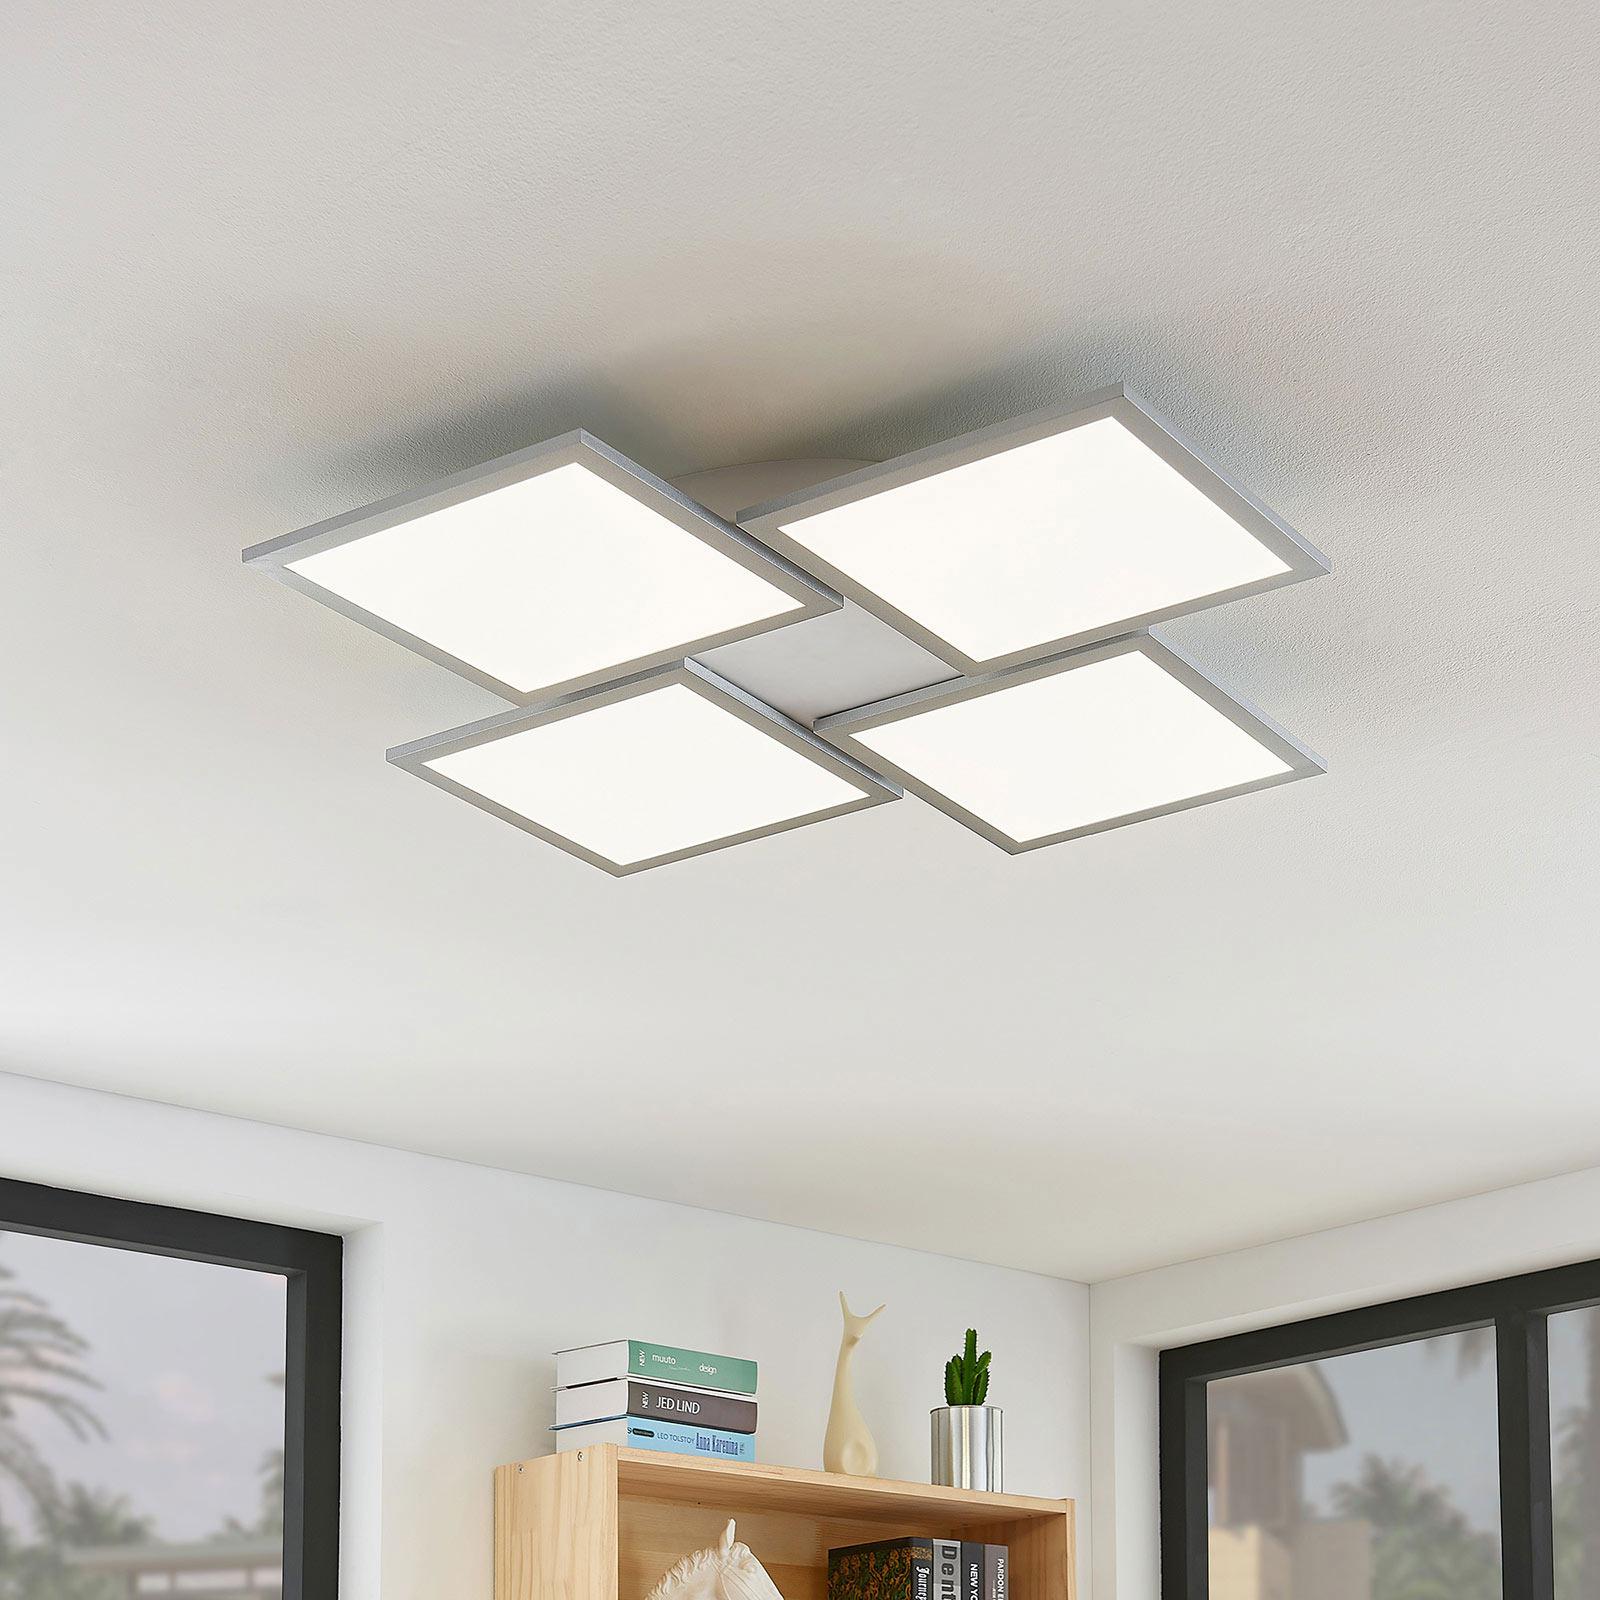 Lampa sufitowa LED Ilira, ściemniana, CCT, 4-pkt.